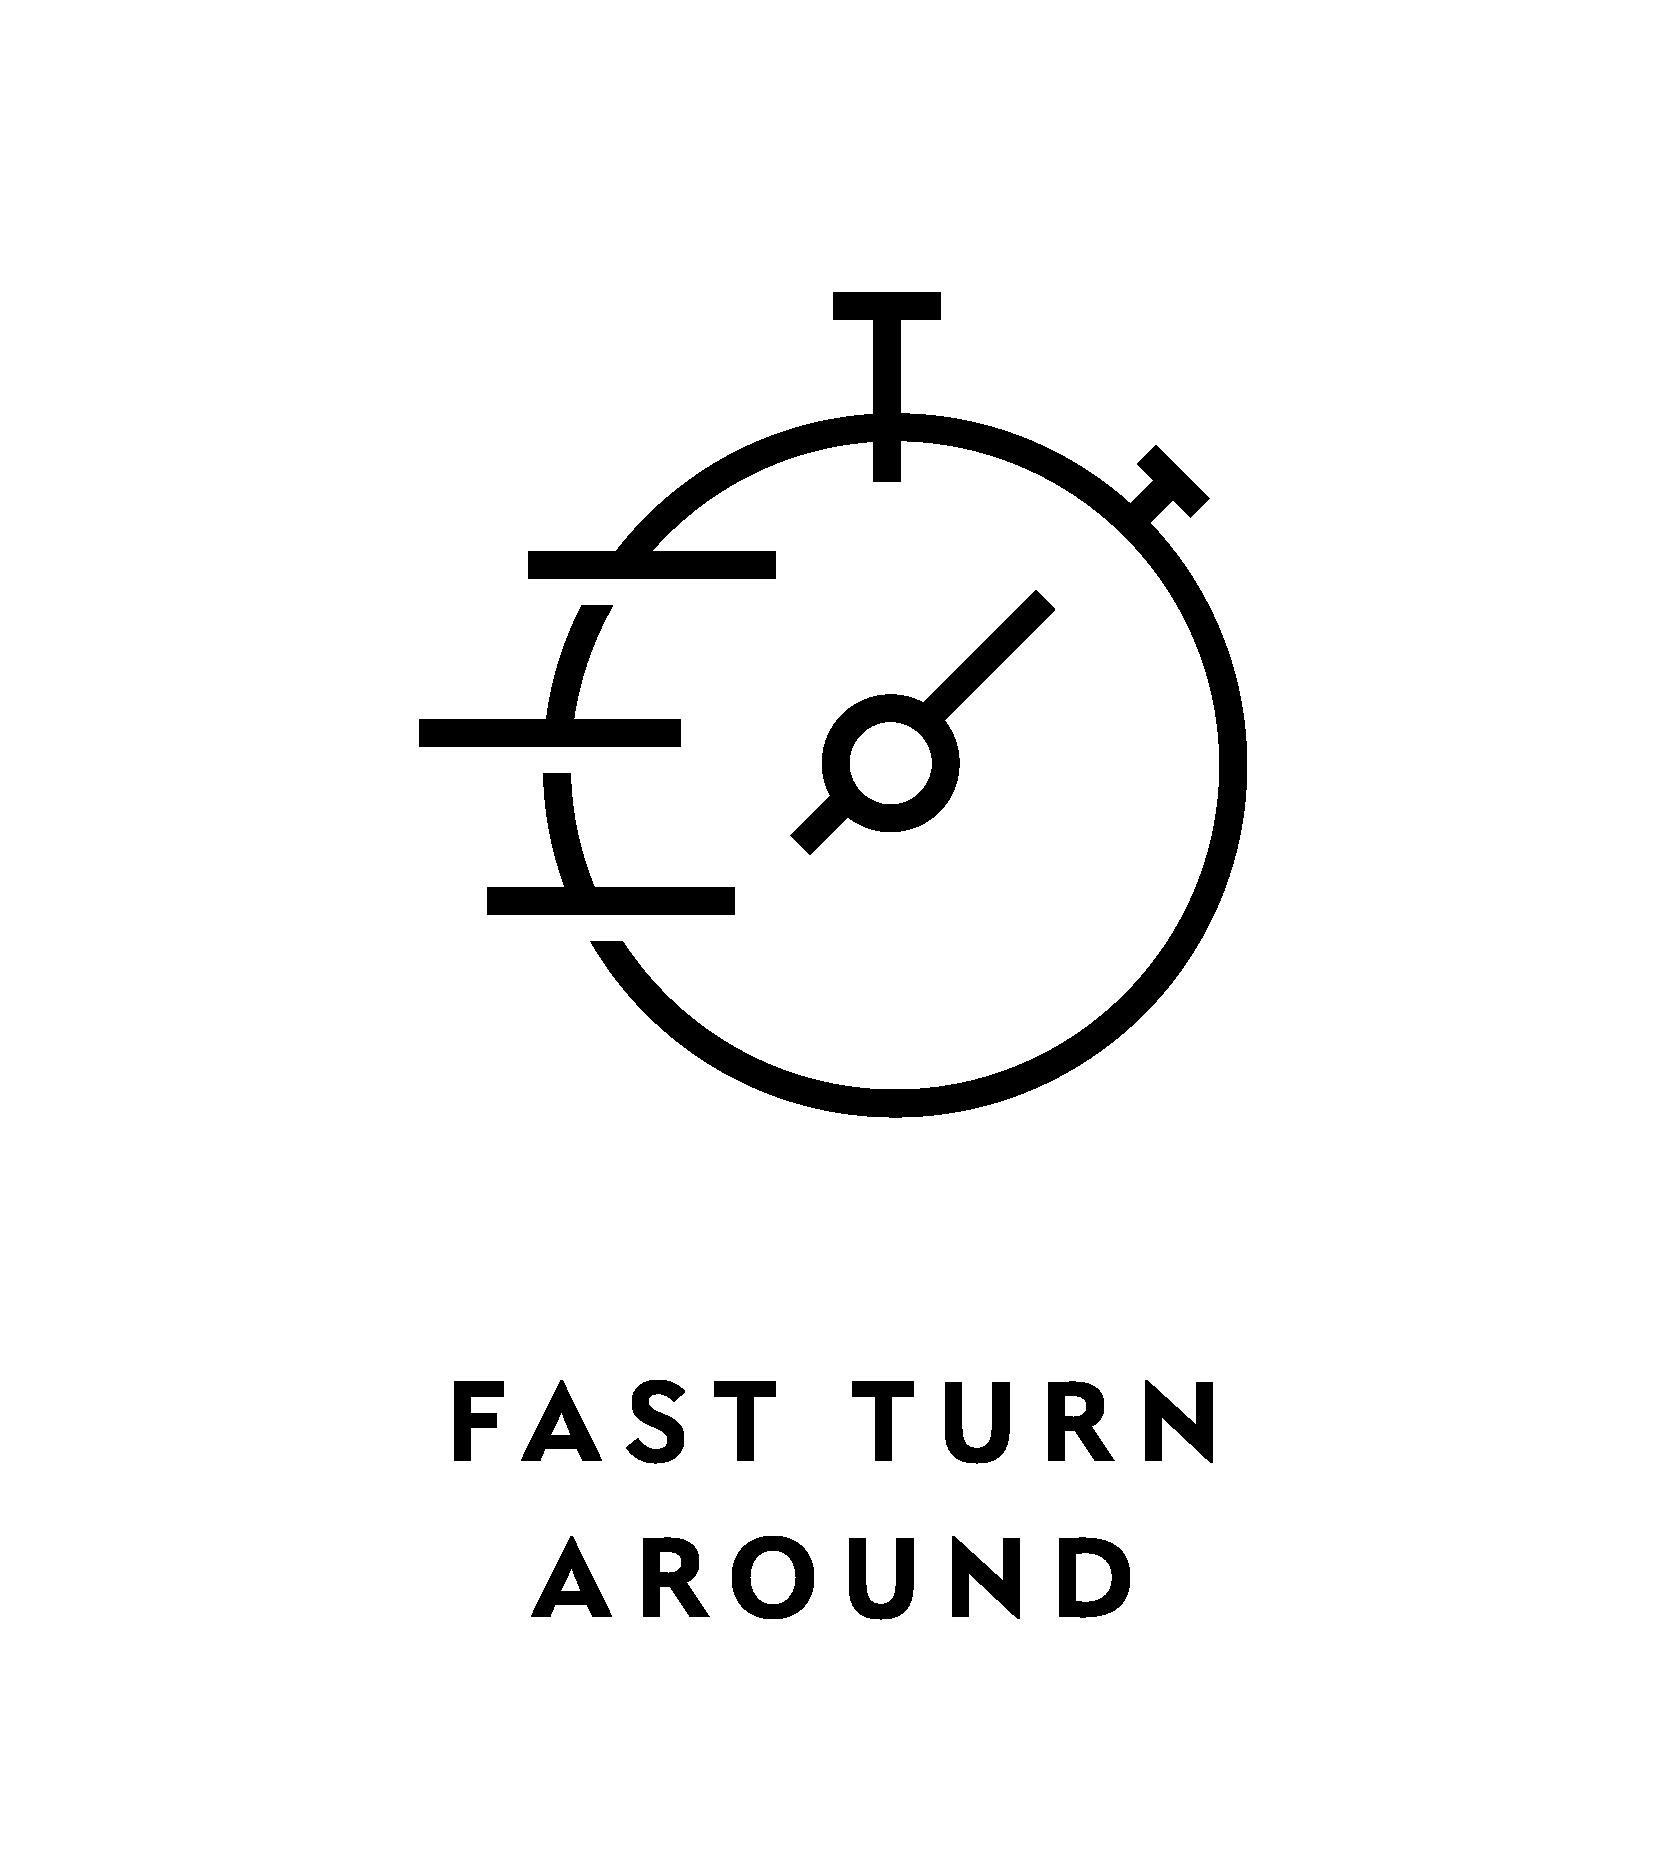 Fast Turnaround logo